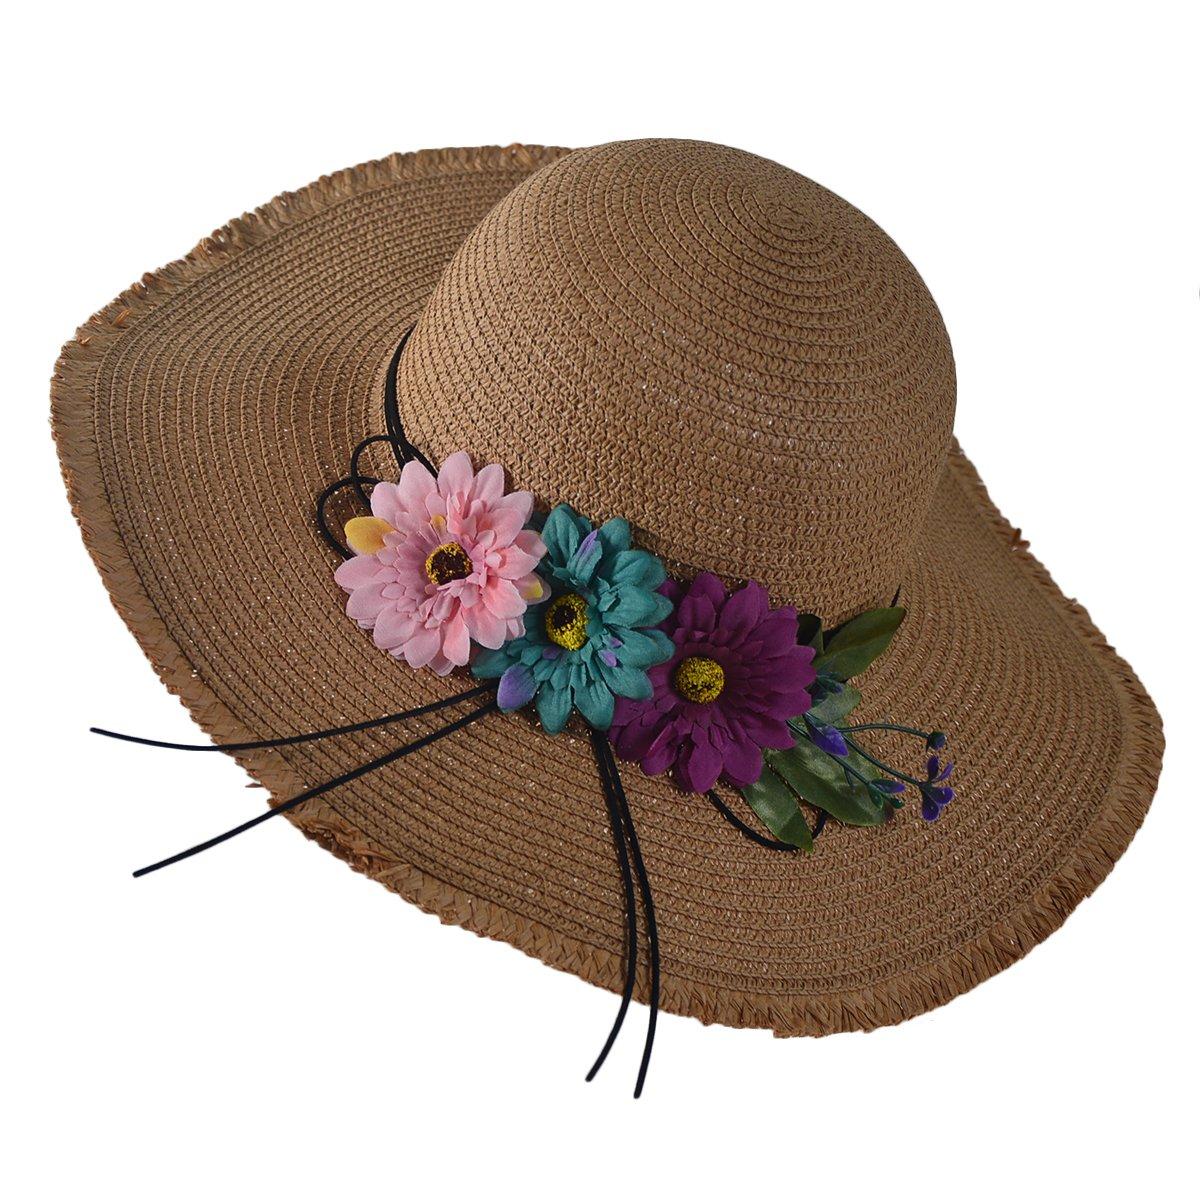 Newest trent Summer Beach Straw Hat Wide Brim Fishing Hat Folding Travel Beach Cap Fedora Sun Hats For Women